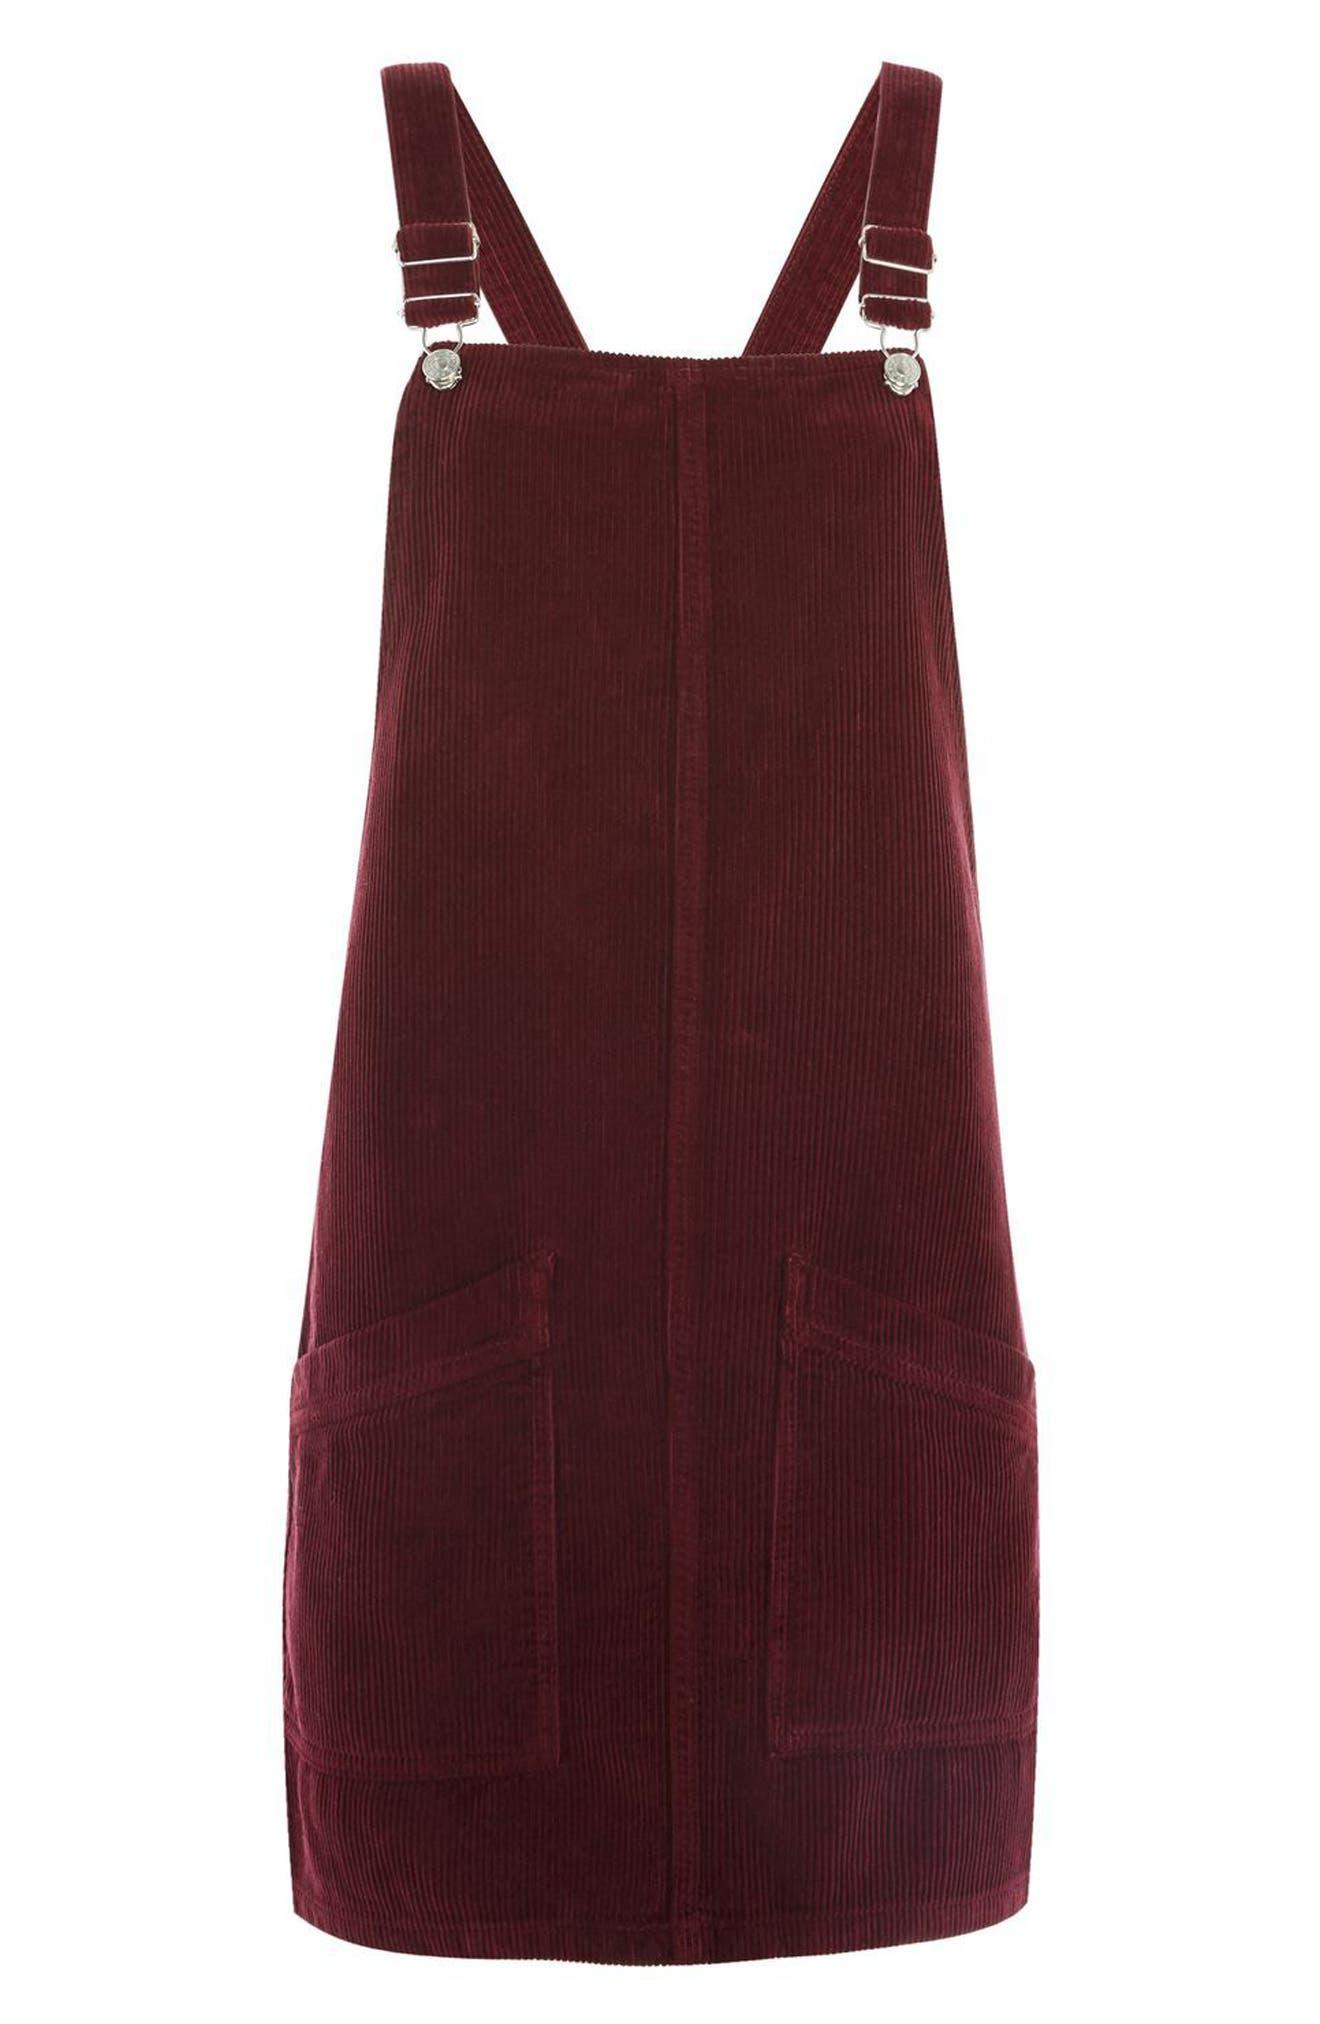 Corduroy Pinafore Dress,                             Alternate thumbnail 4, color,                             Burgundy